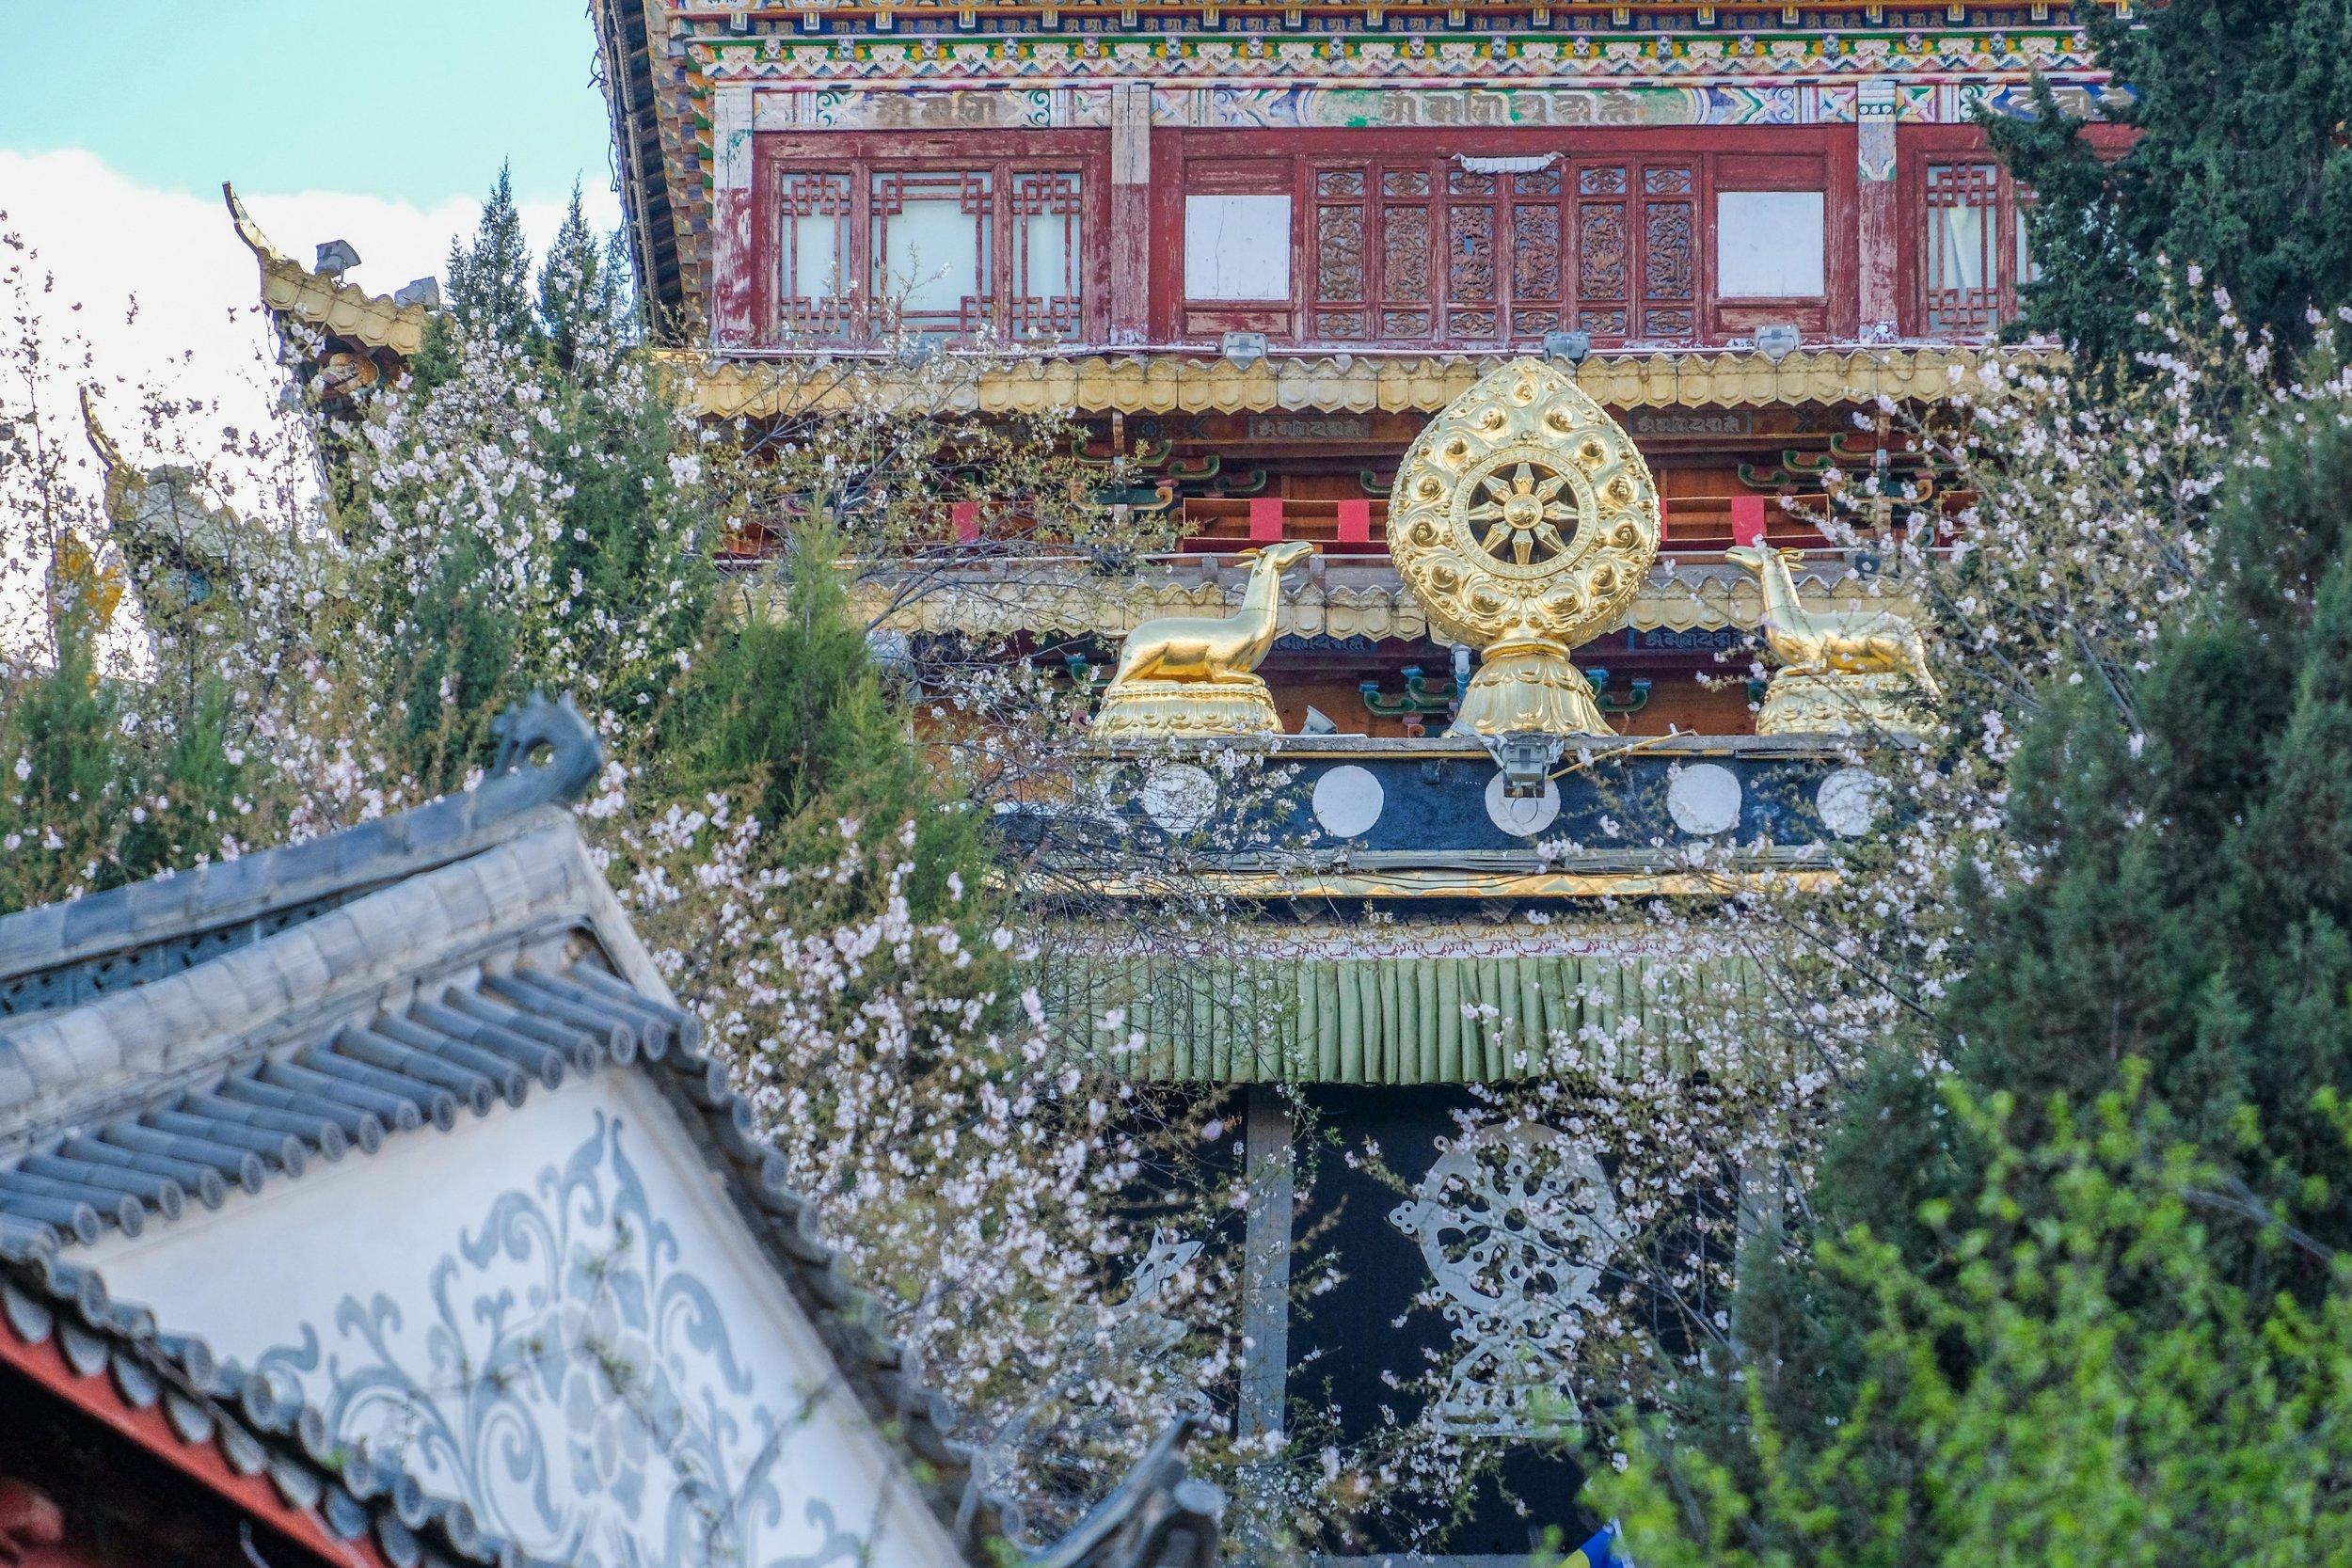 Zhongdian_lo-res-2501.jpg